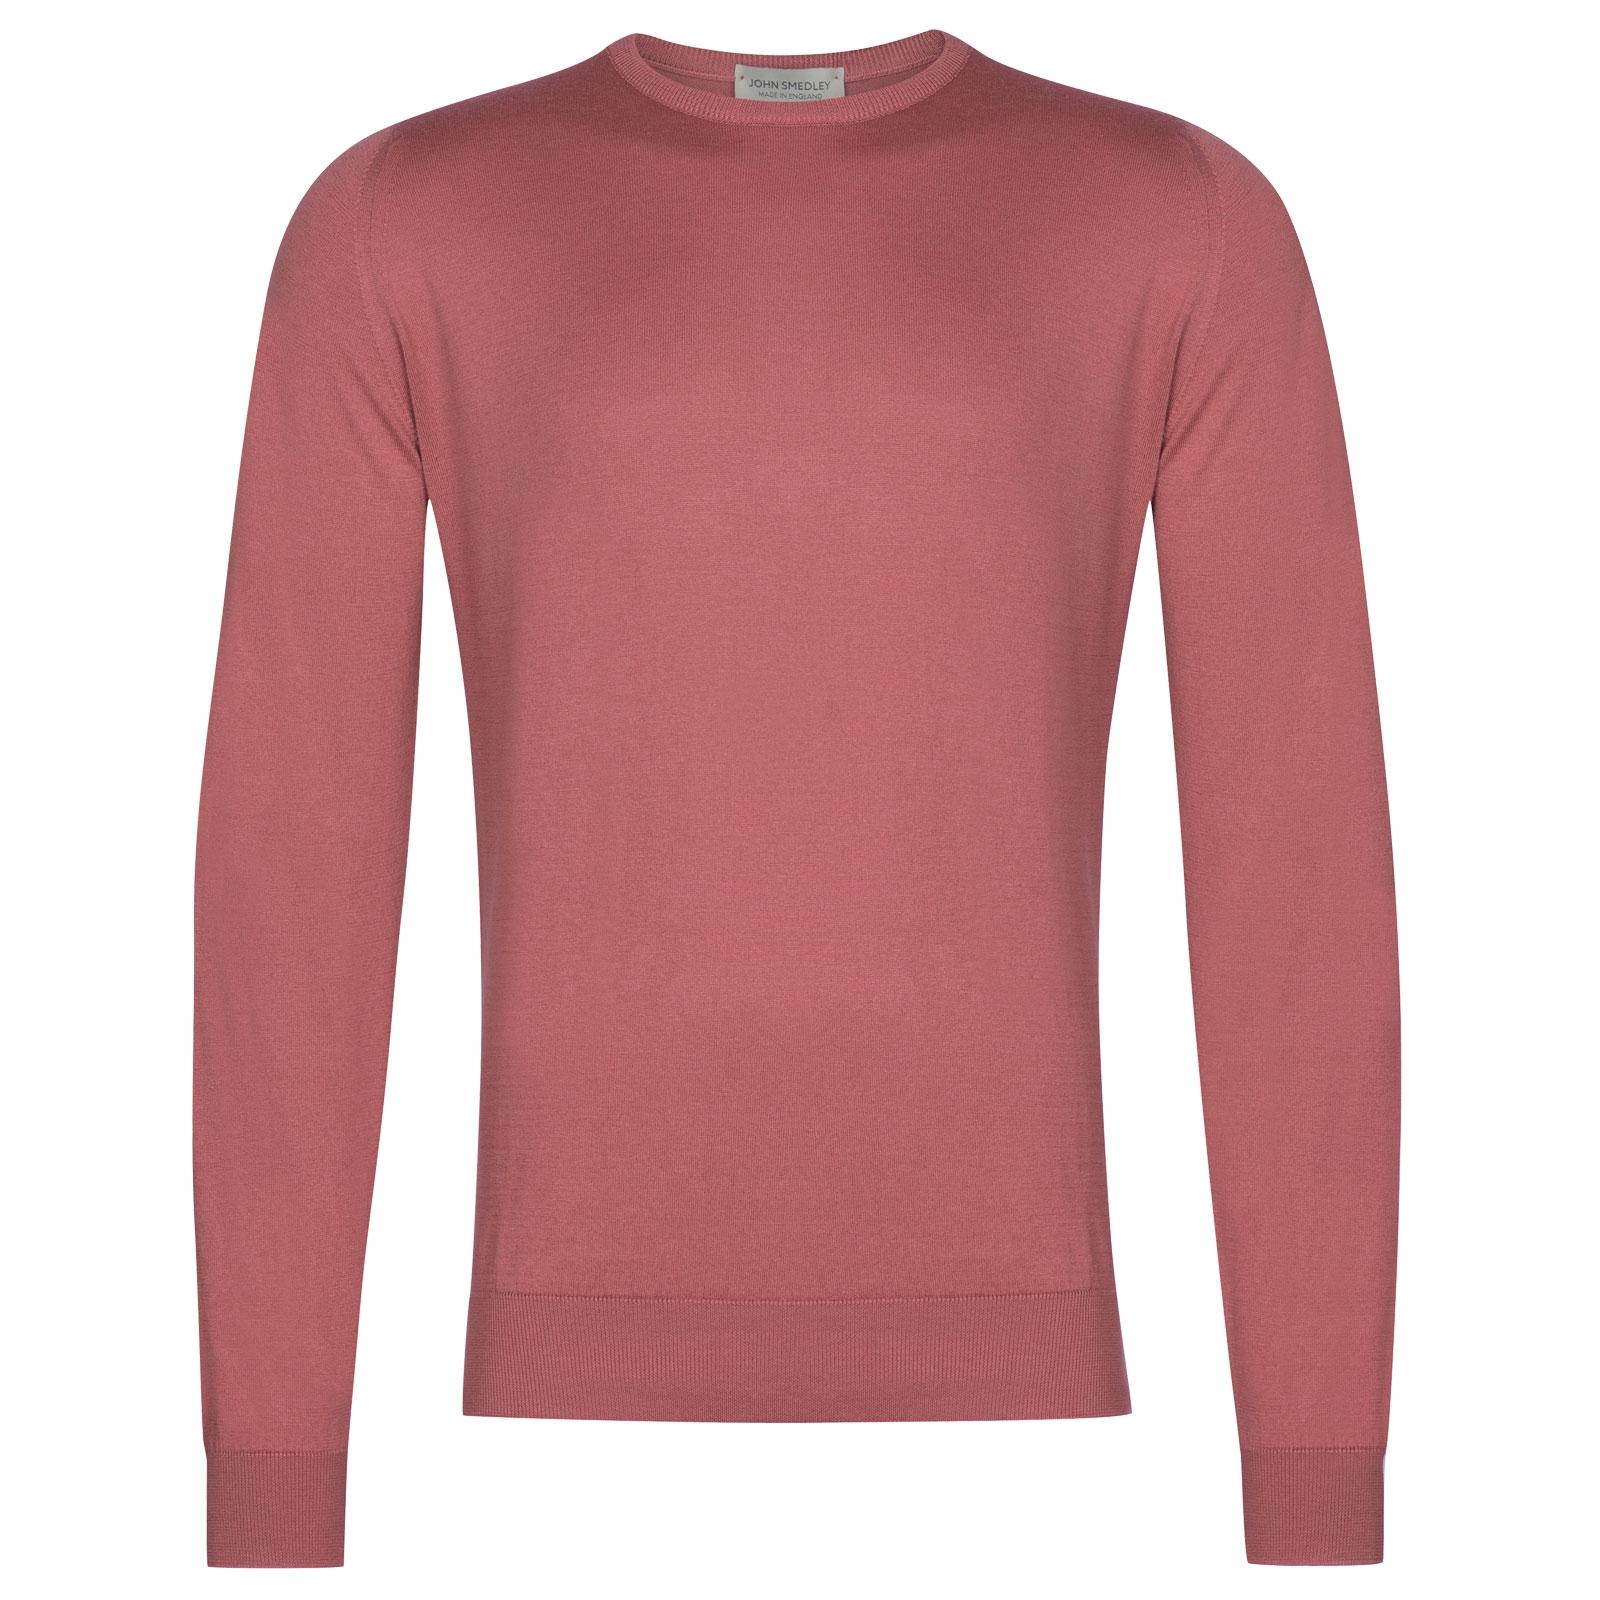 John Smedley Hatfield in Azalea Pink Pullover-XXL